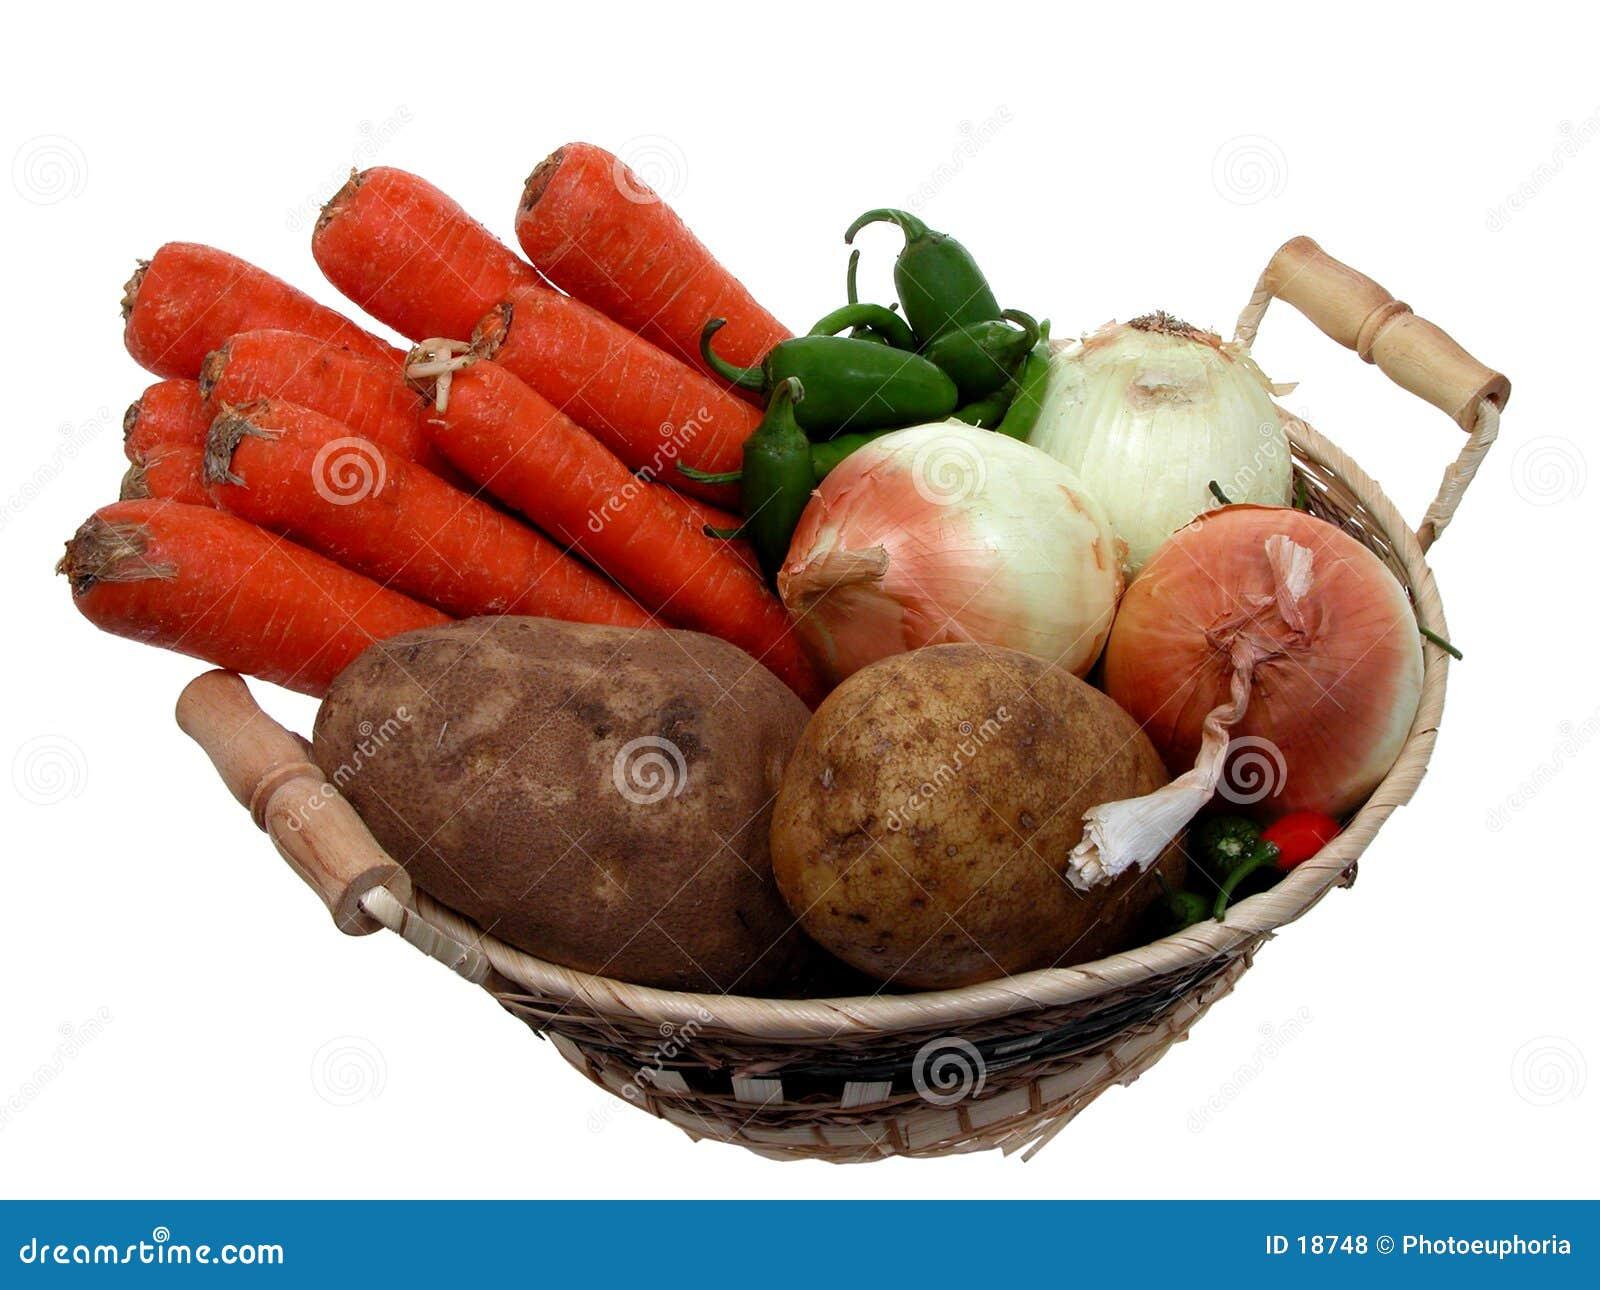 Food: Veggie Basket